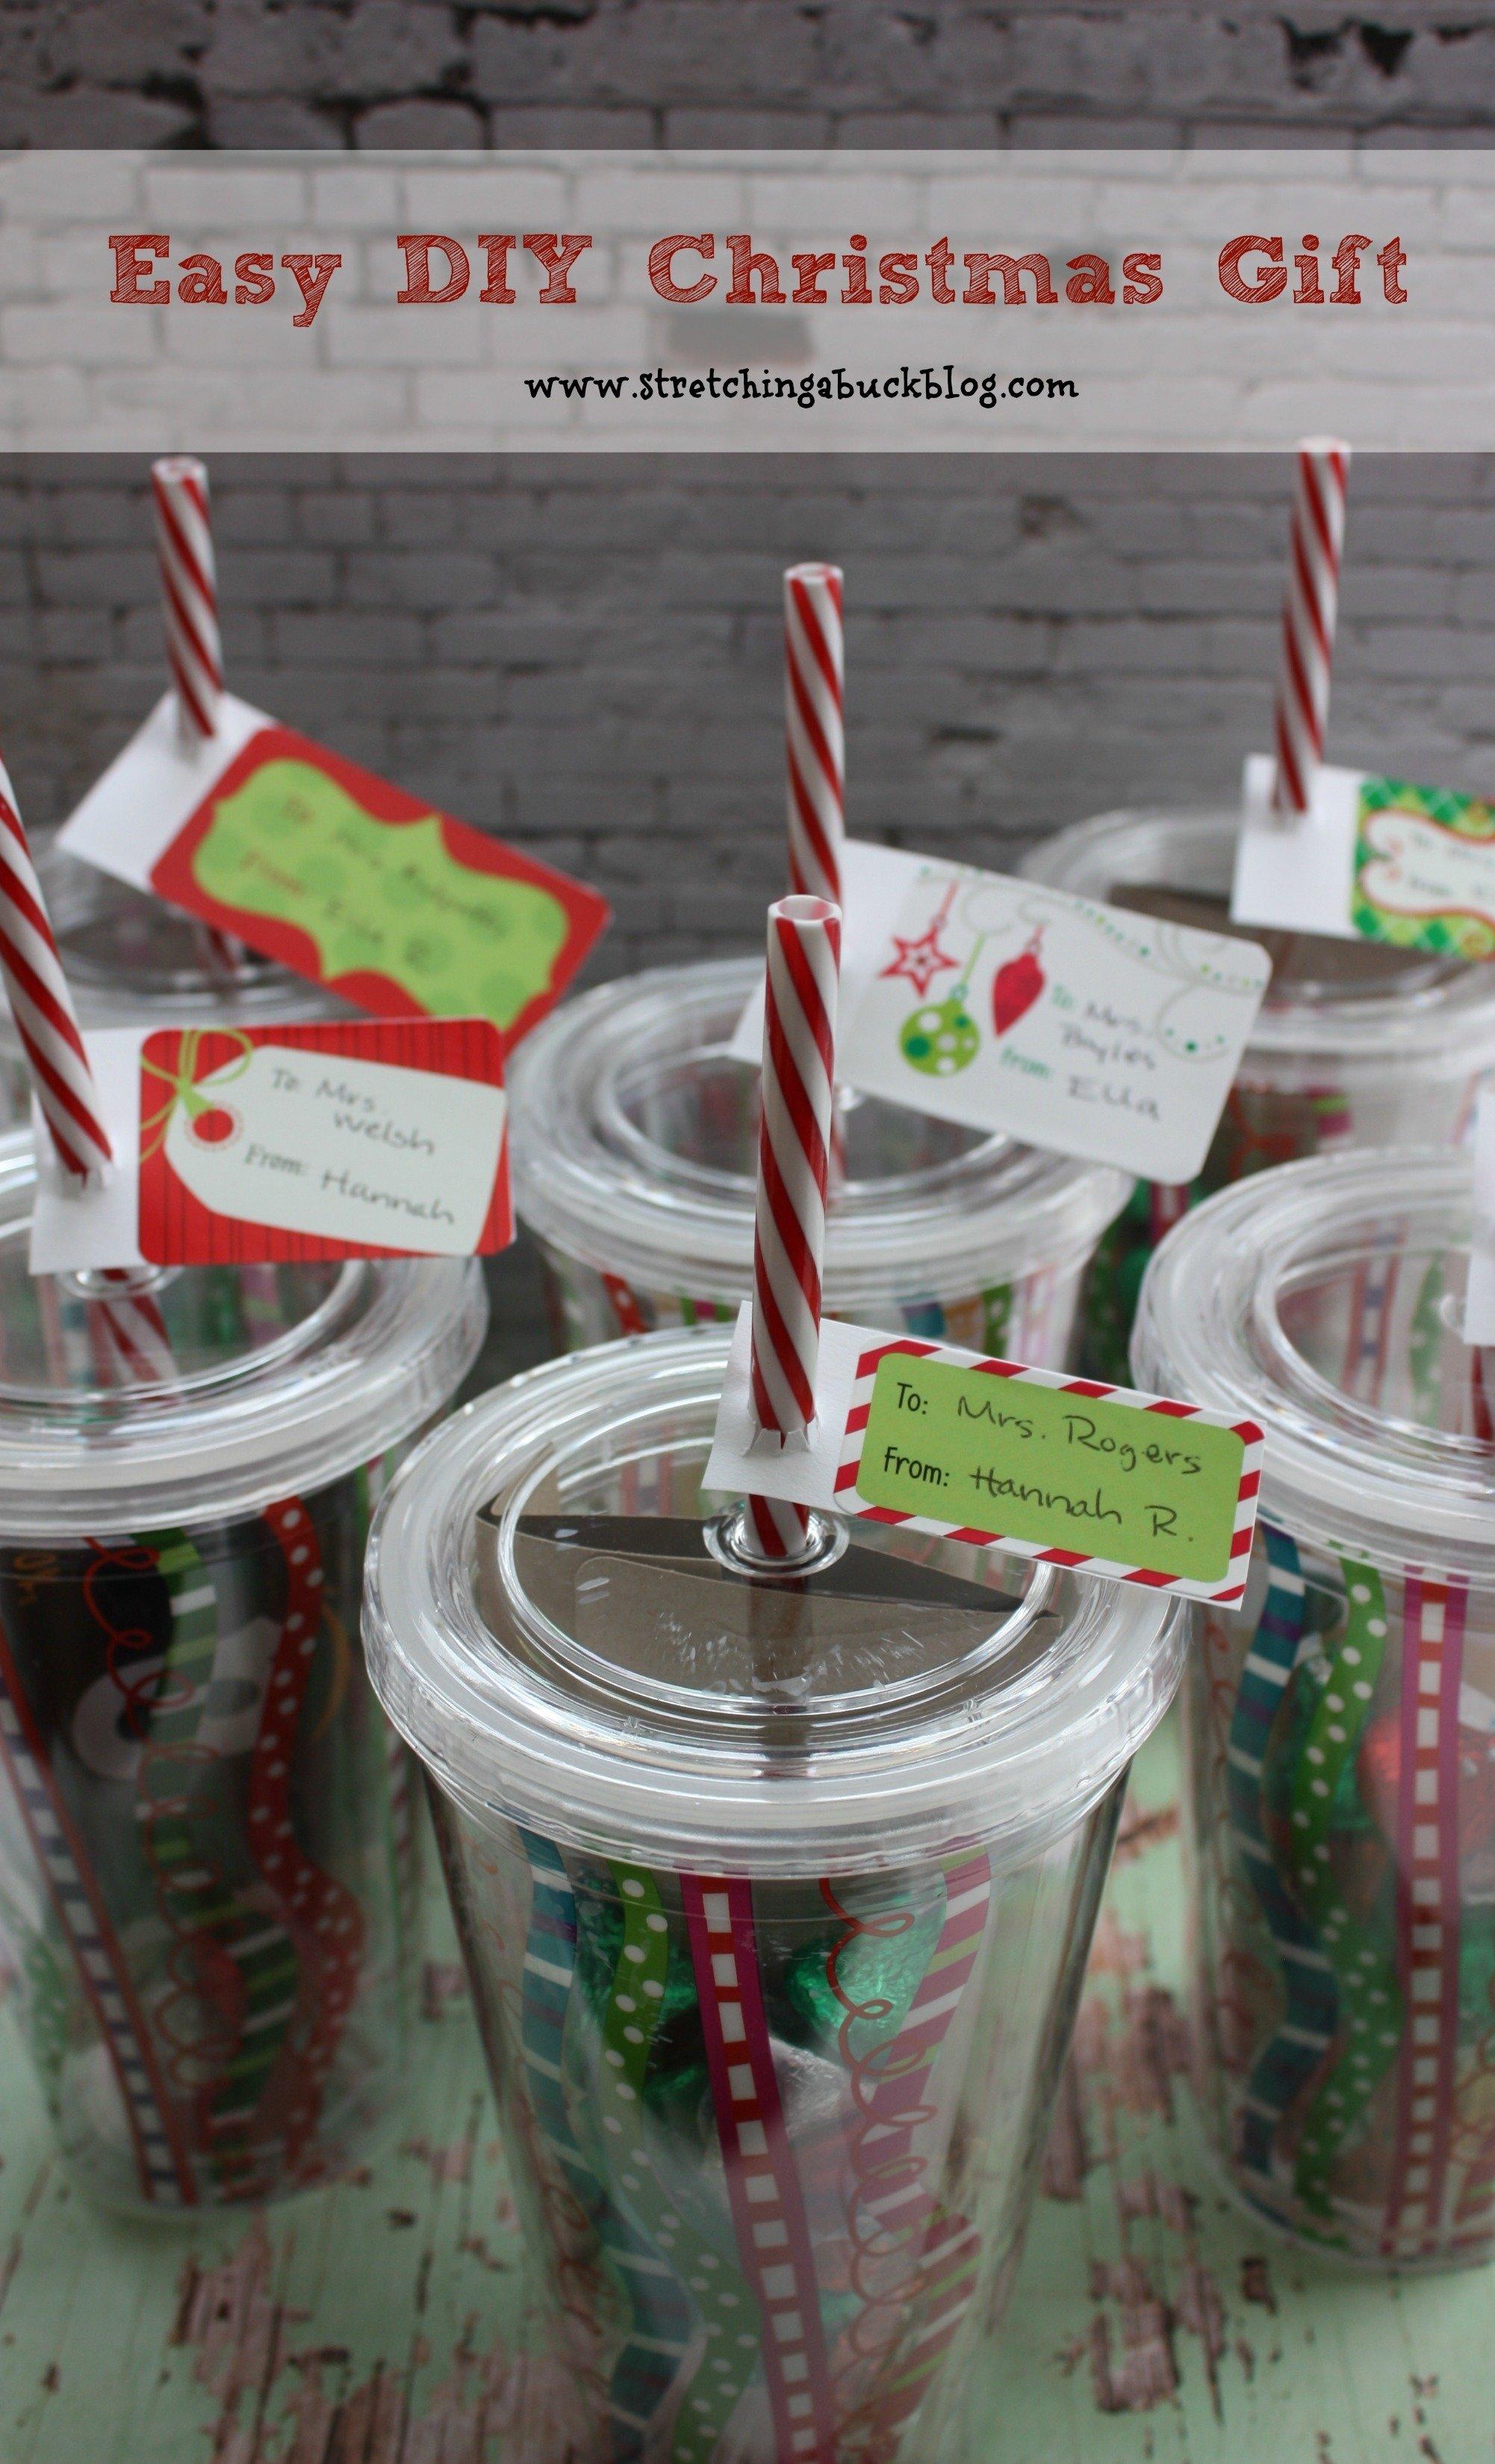 10 Fashionable Holiday Gift Ideas For Teachers easy diy christmas gift idea for teachers friends more 12 2021